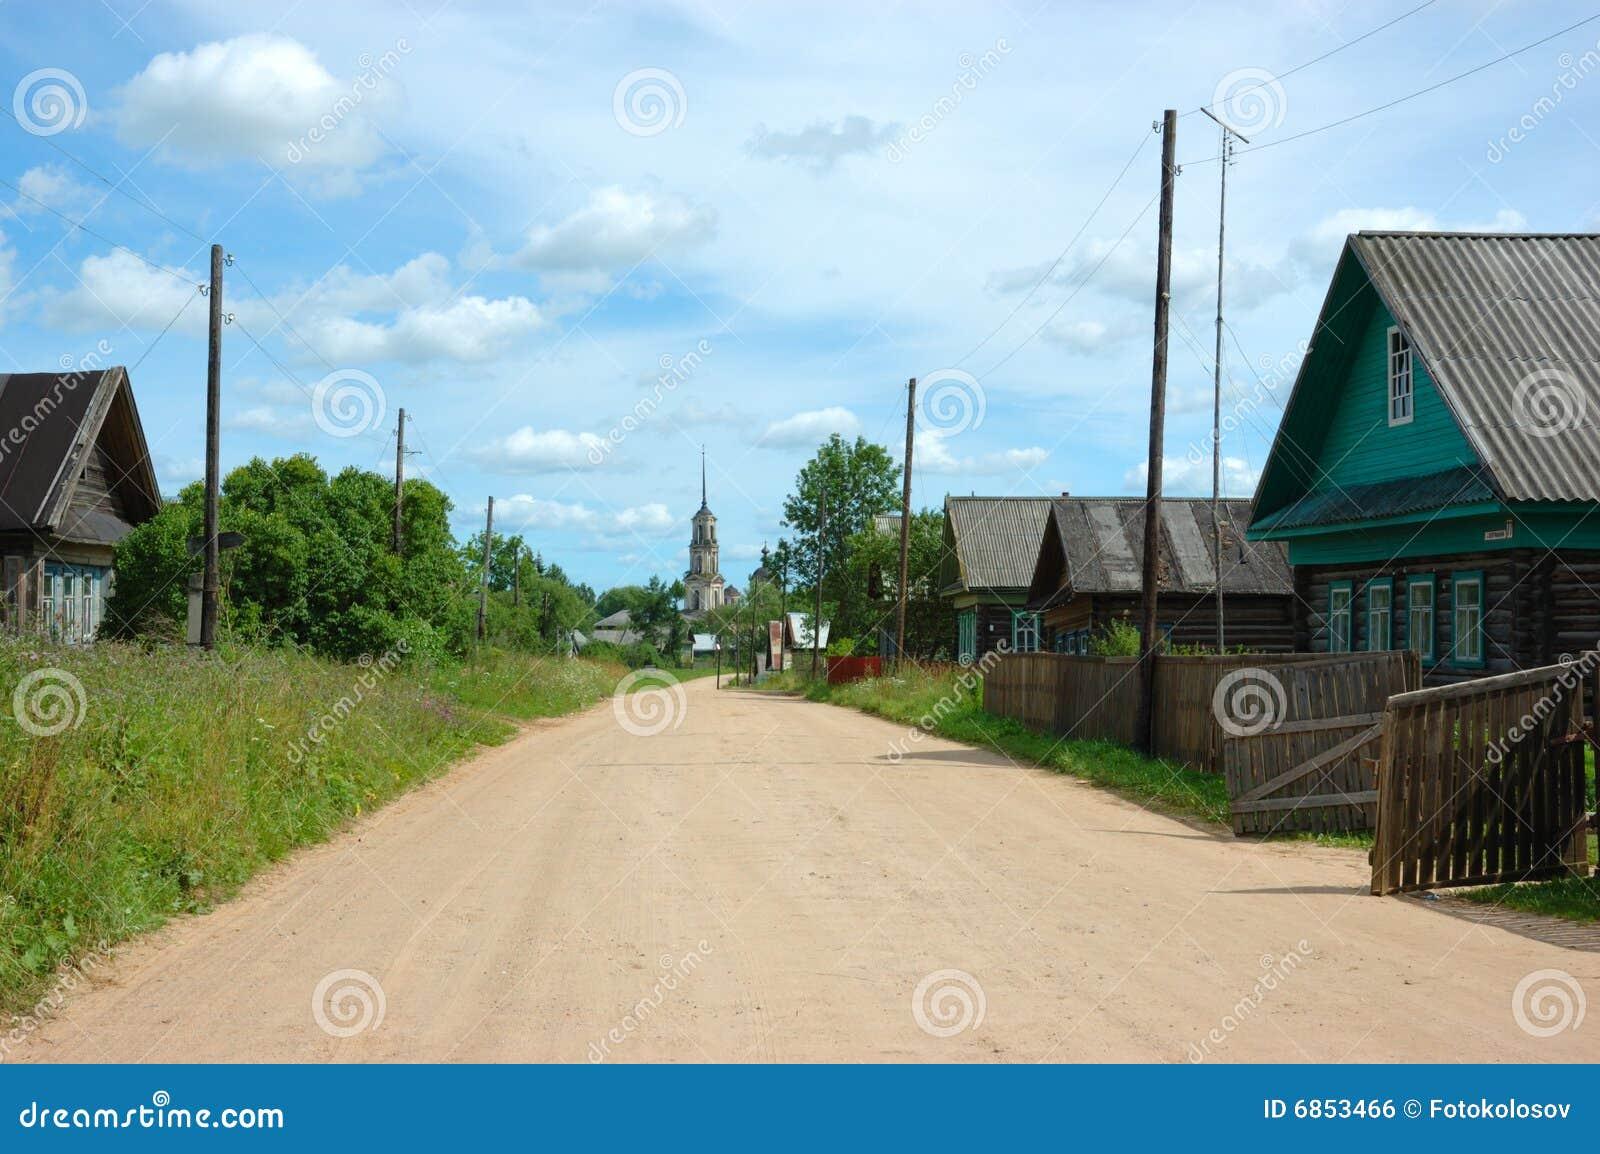 Rural street stock photo. Image of green, scene, orthodox ...